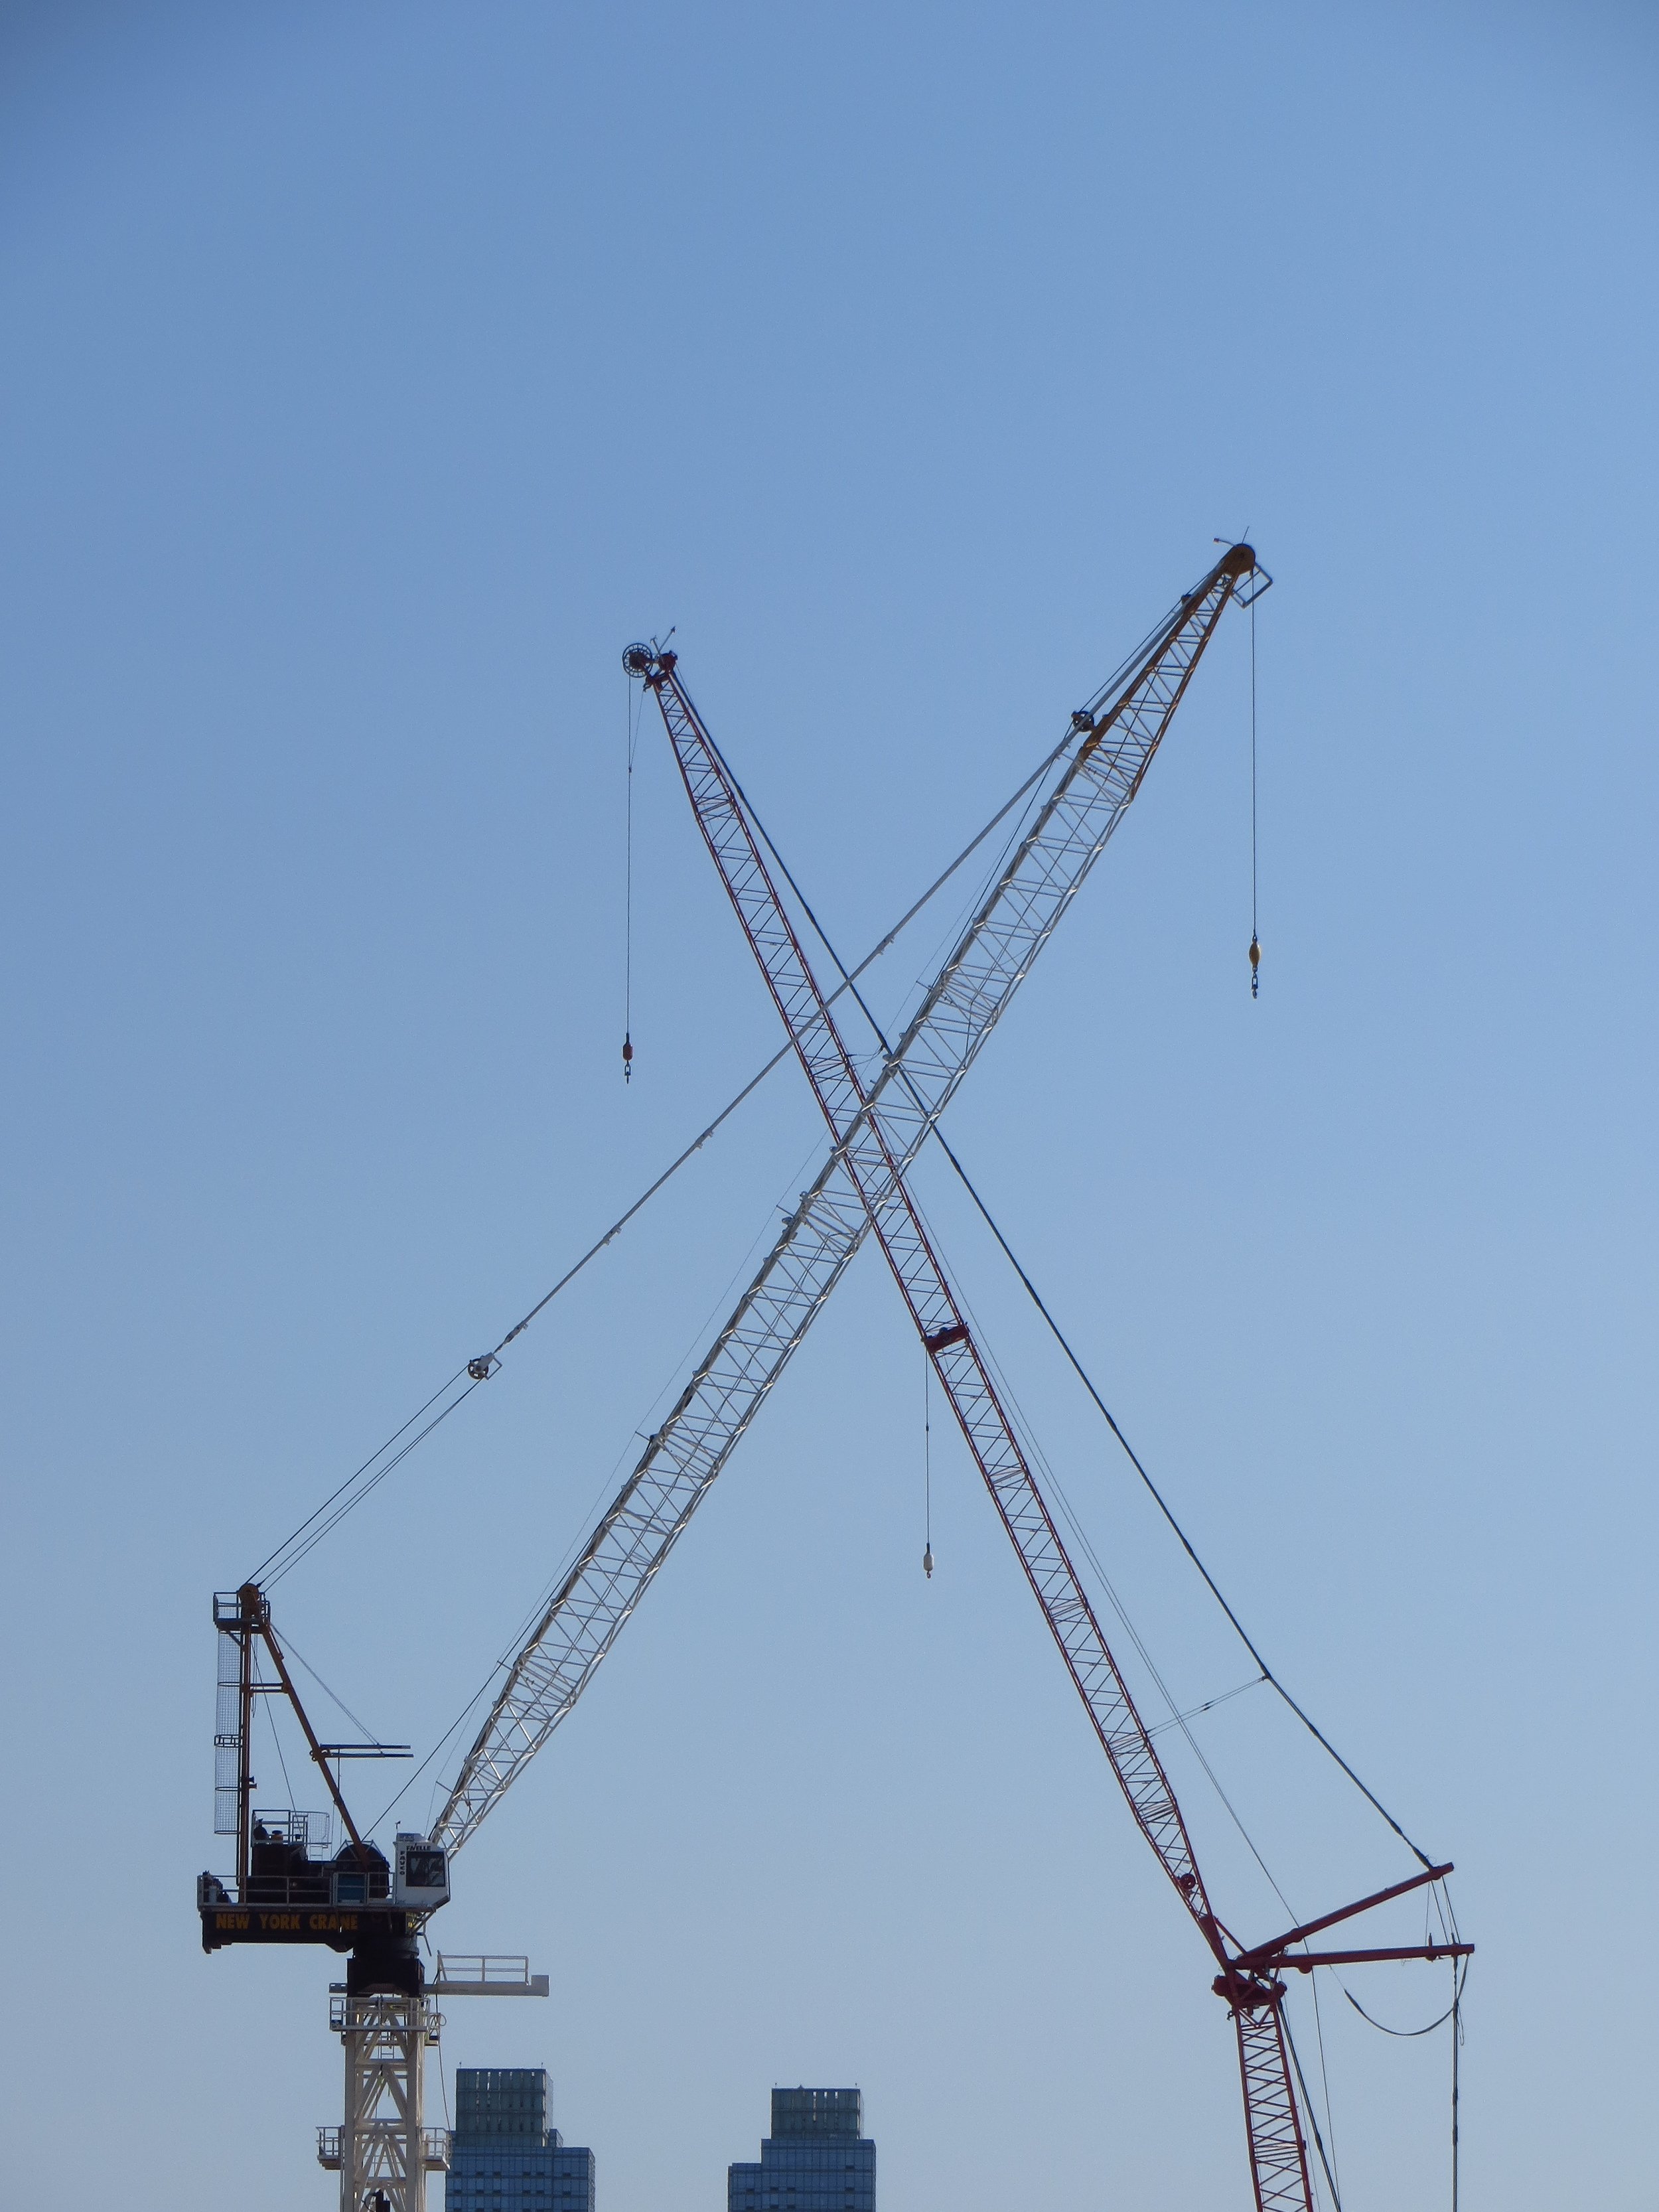 Crossed cranes